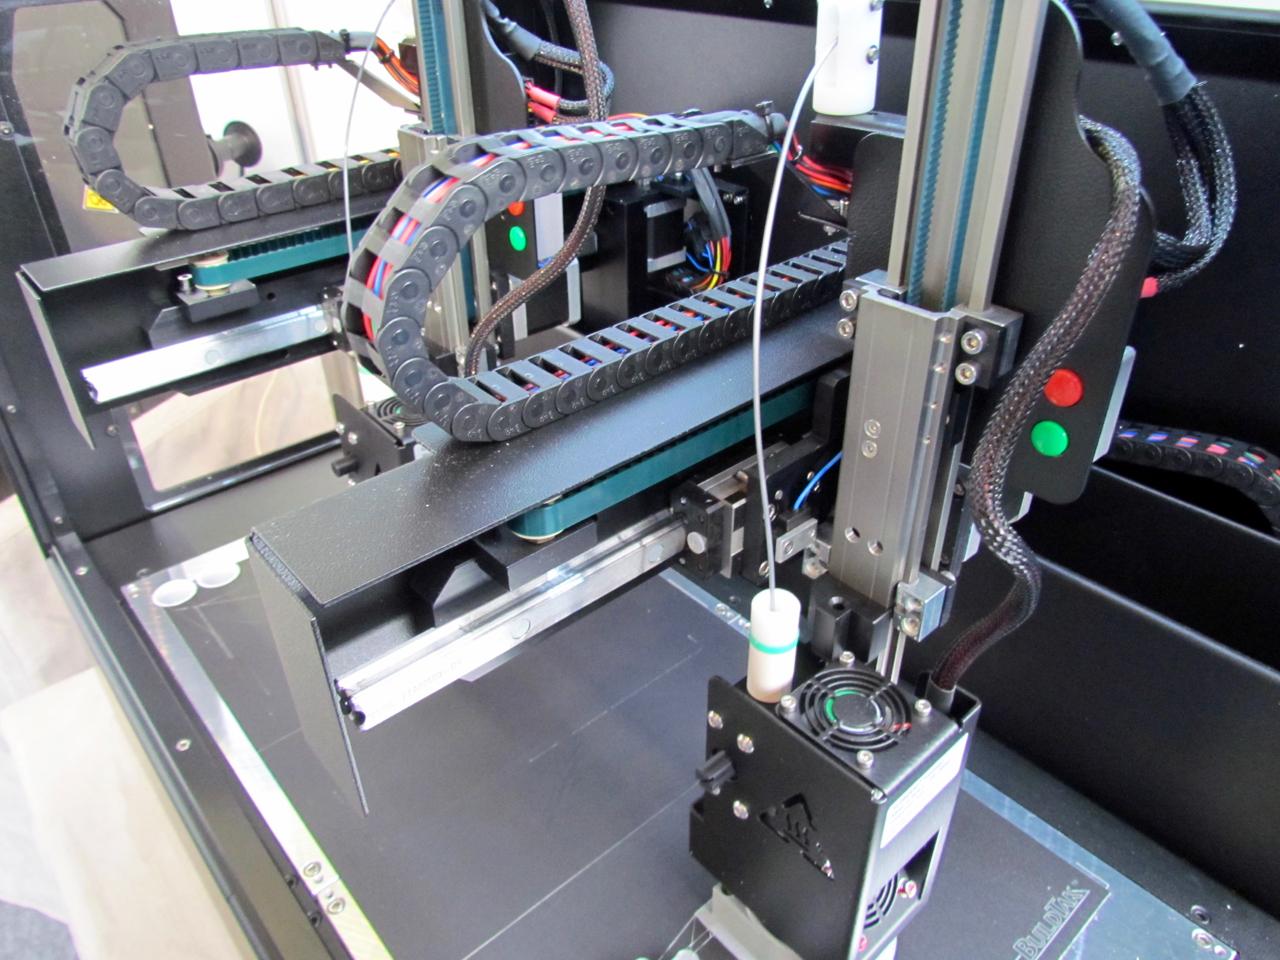 The Kloner3D desktop 3D printer's dual extruders